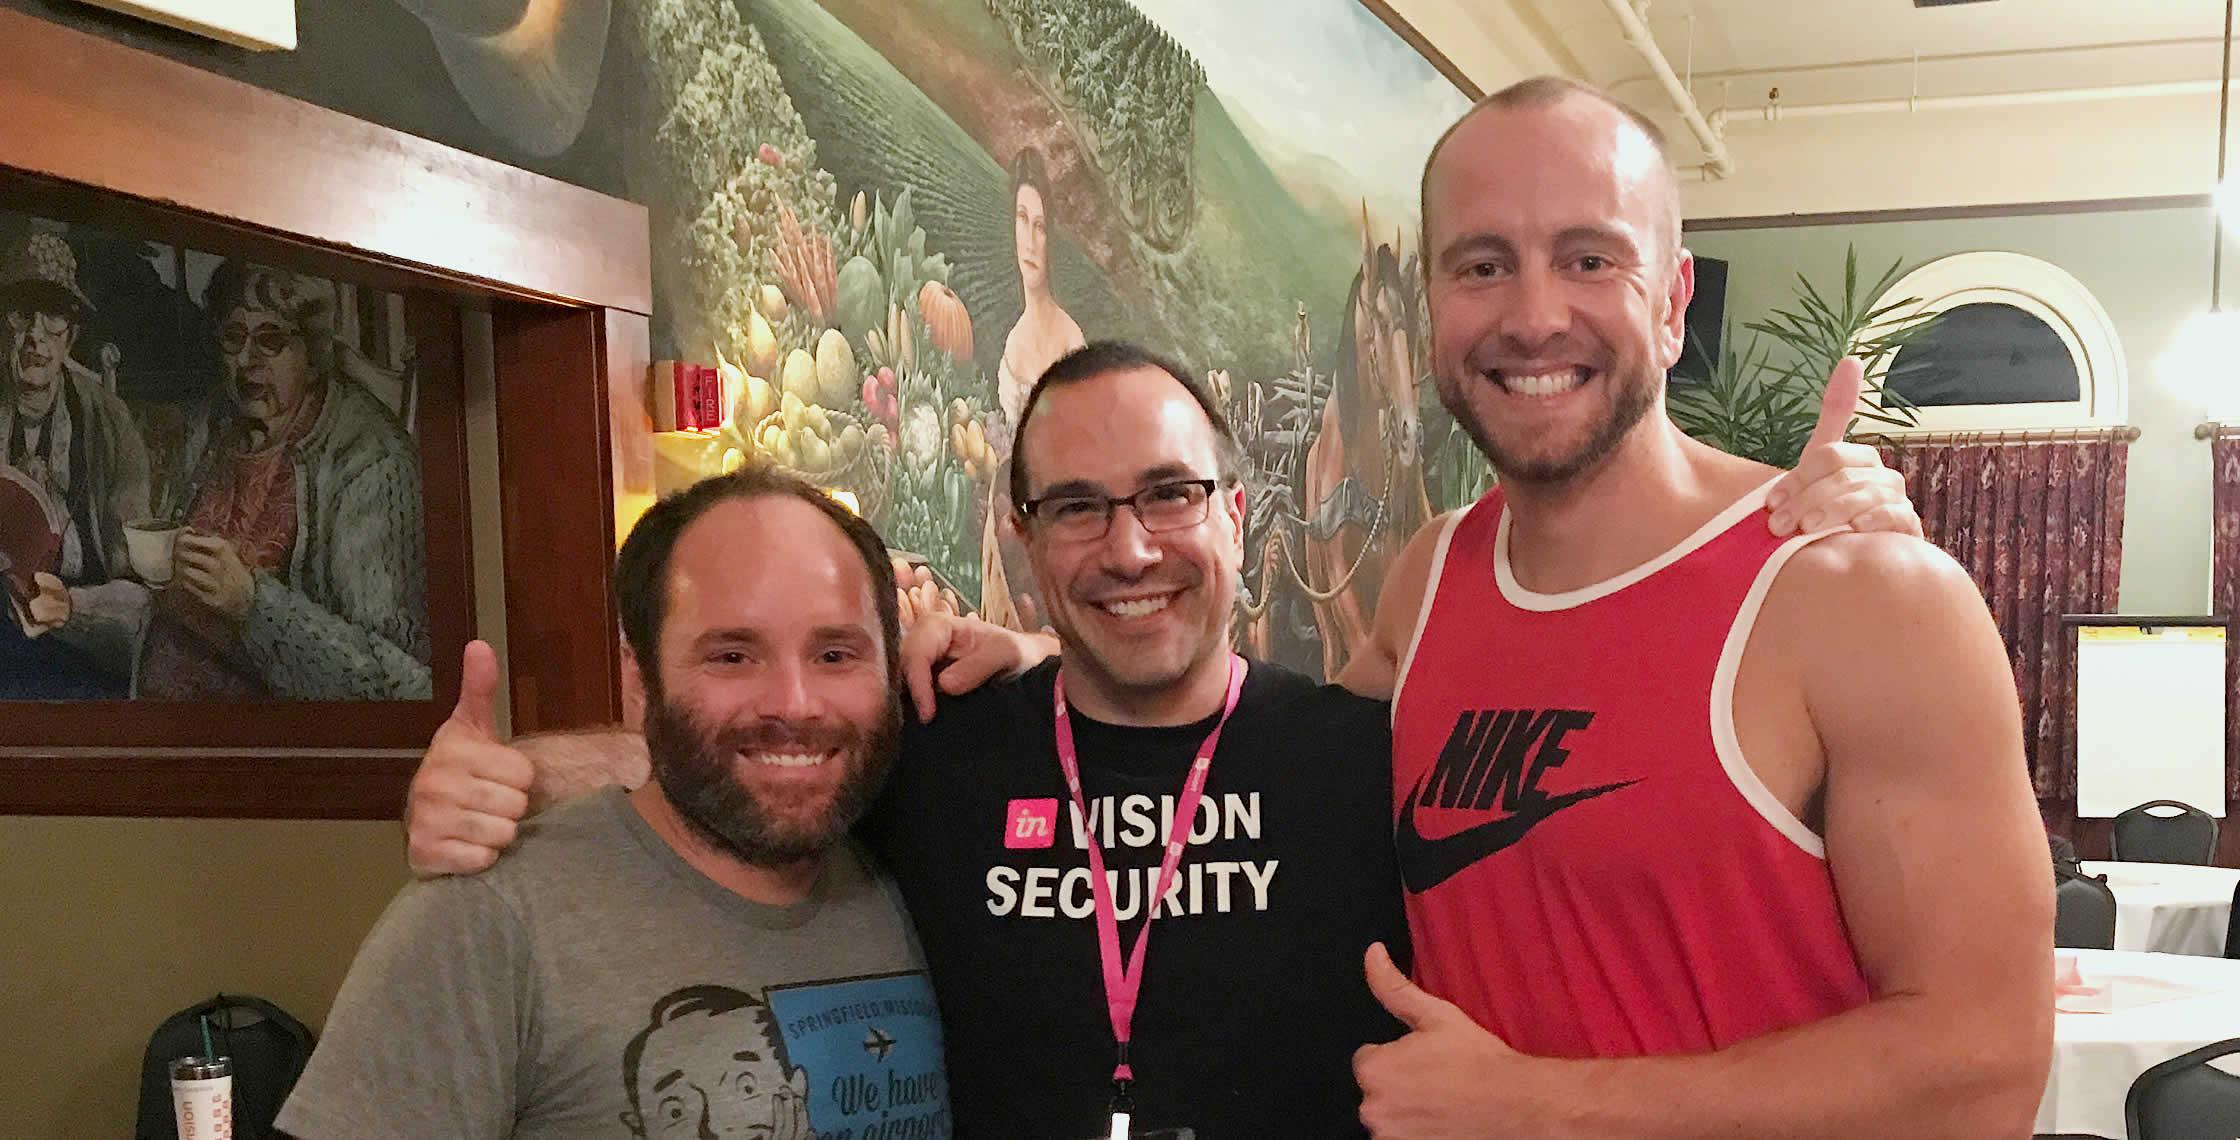 Ben Nadel at Endless Sunshine 2017 (Portland, OR) with: Landon Lewis and Brian Blocker